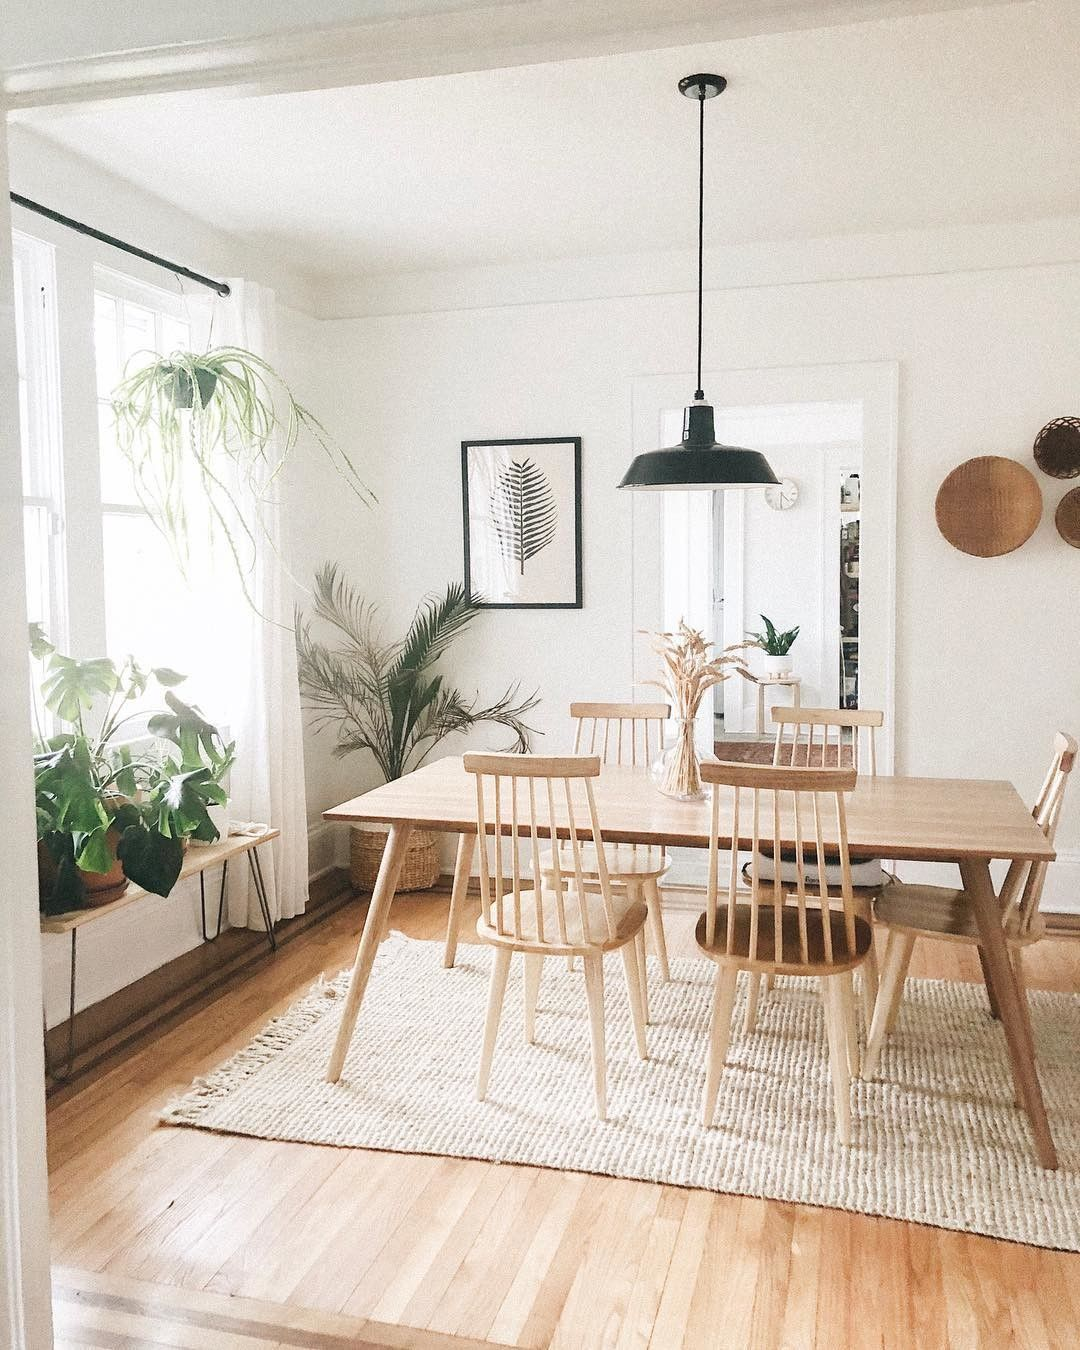 Seno Oak Dining Table For 6 #diningroom